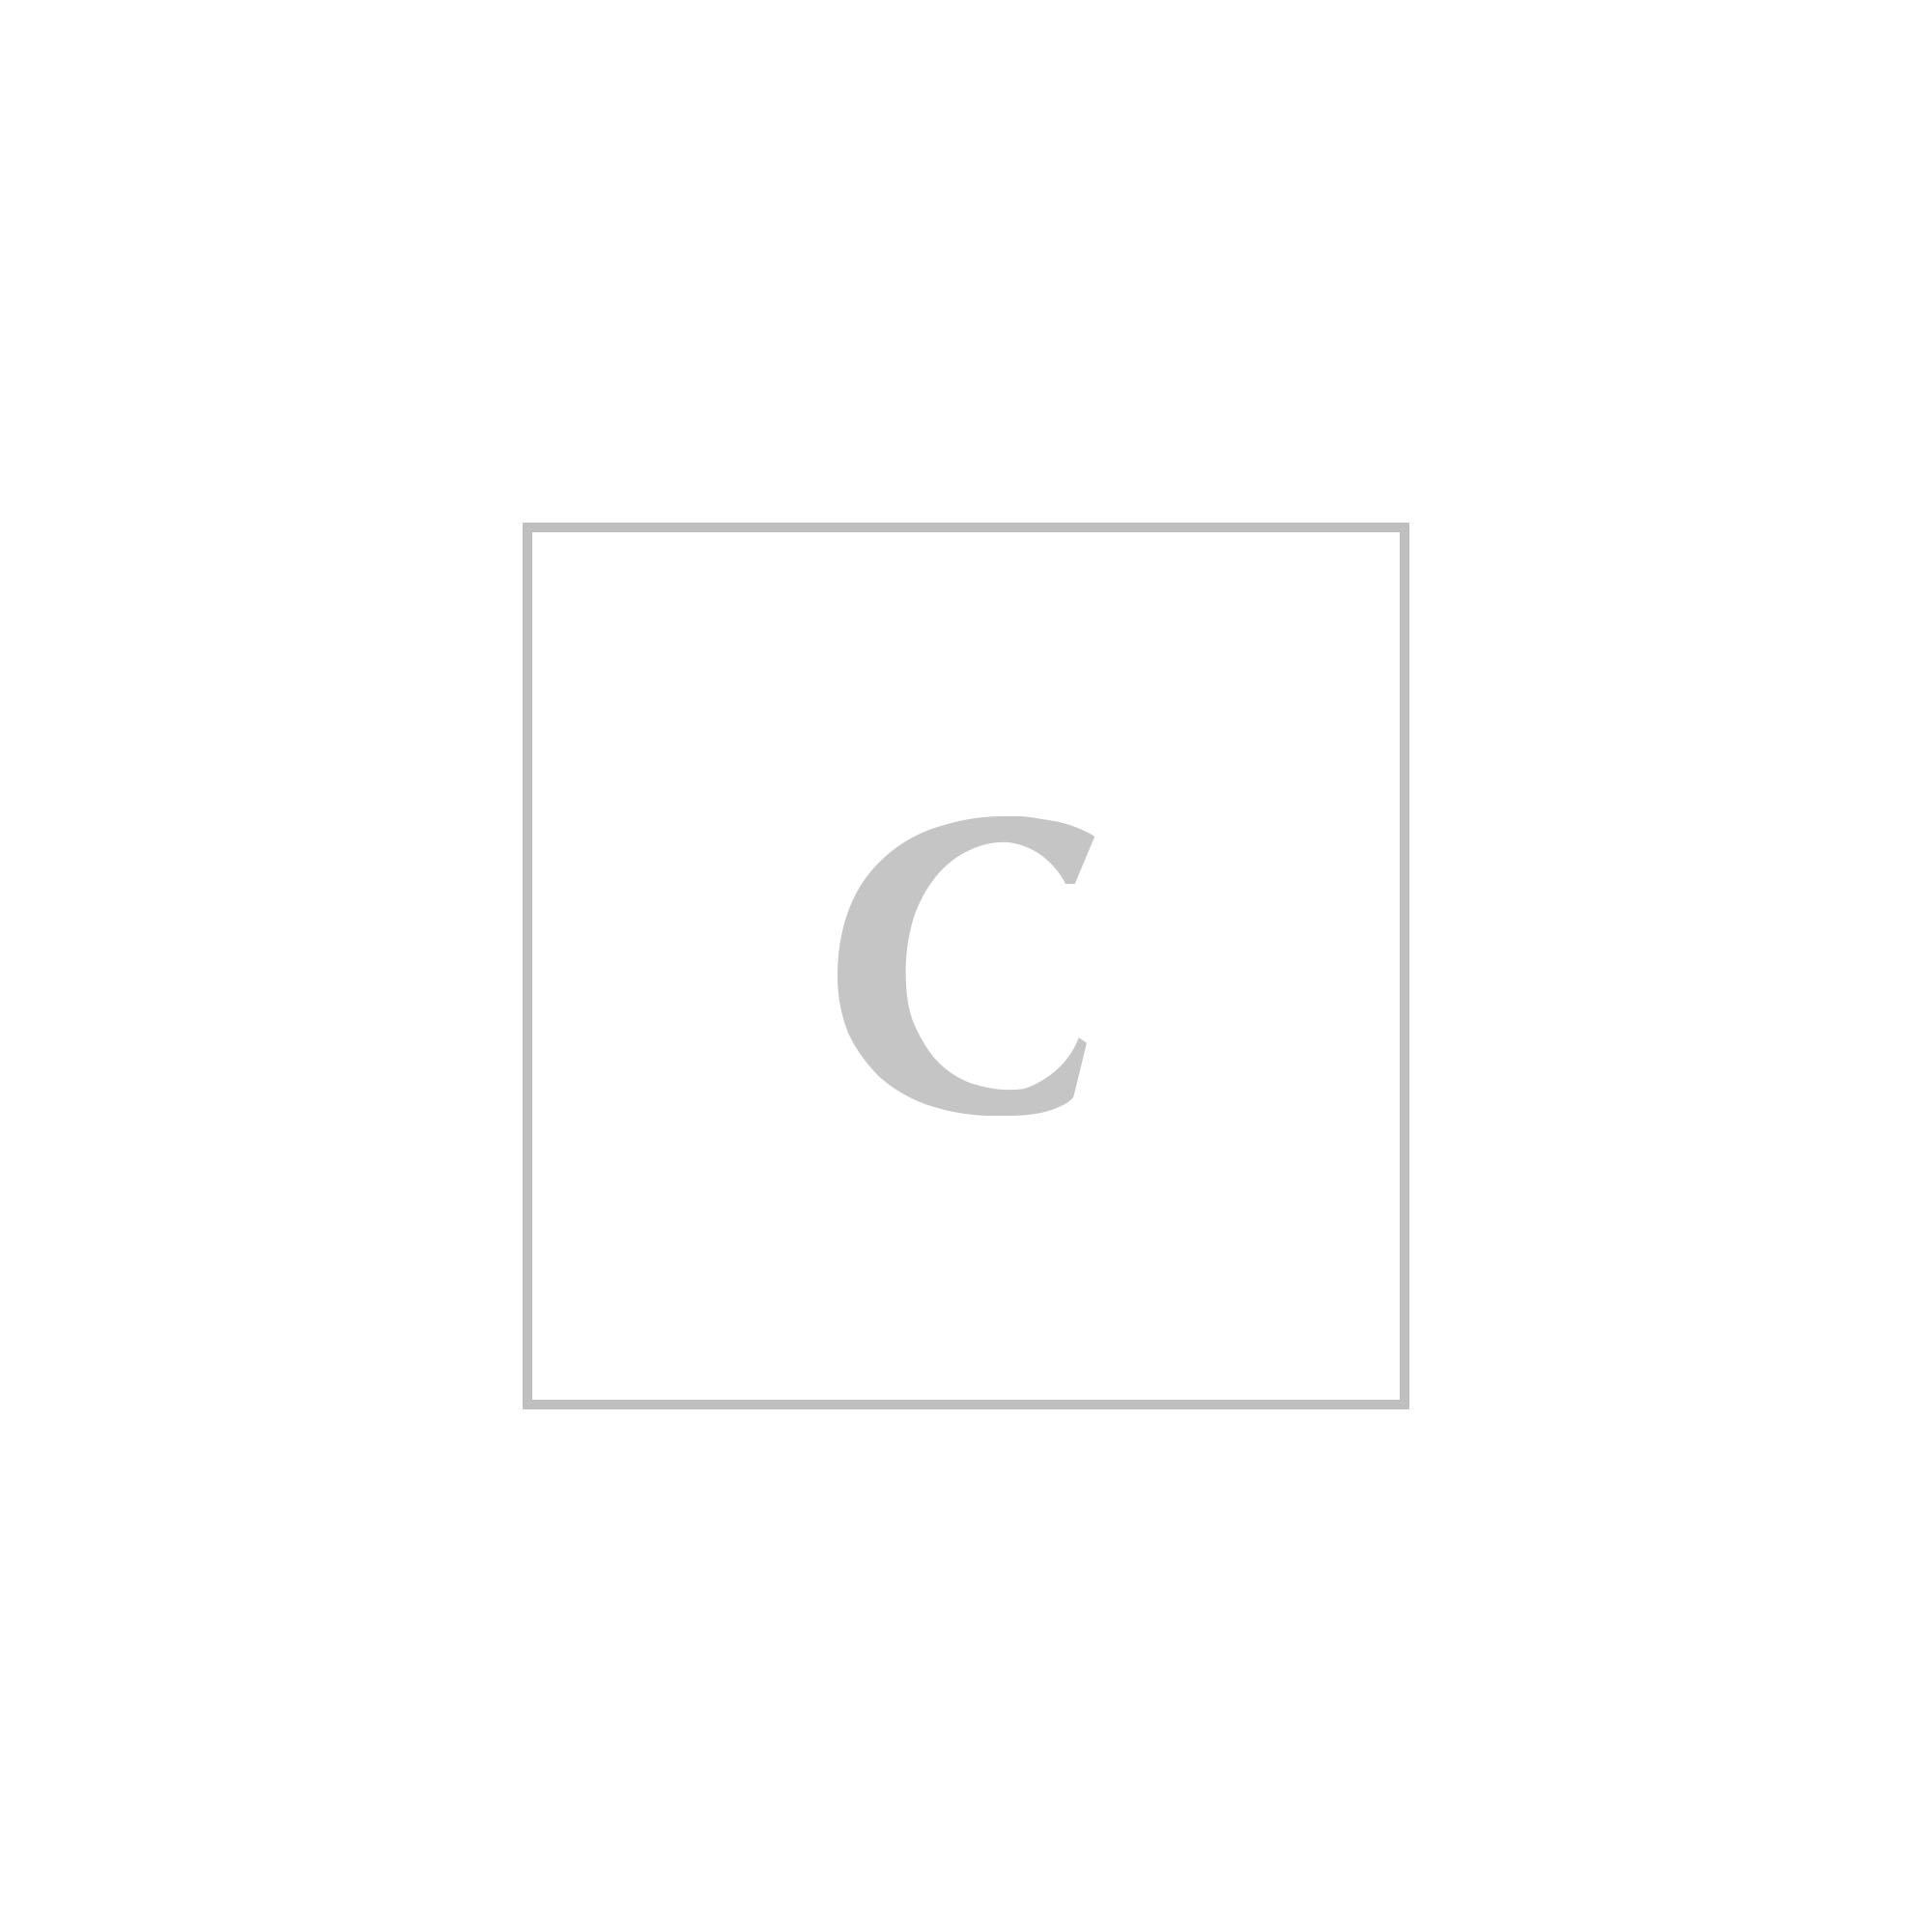 Christian Dior borsa lady dior md pearled lambskin